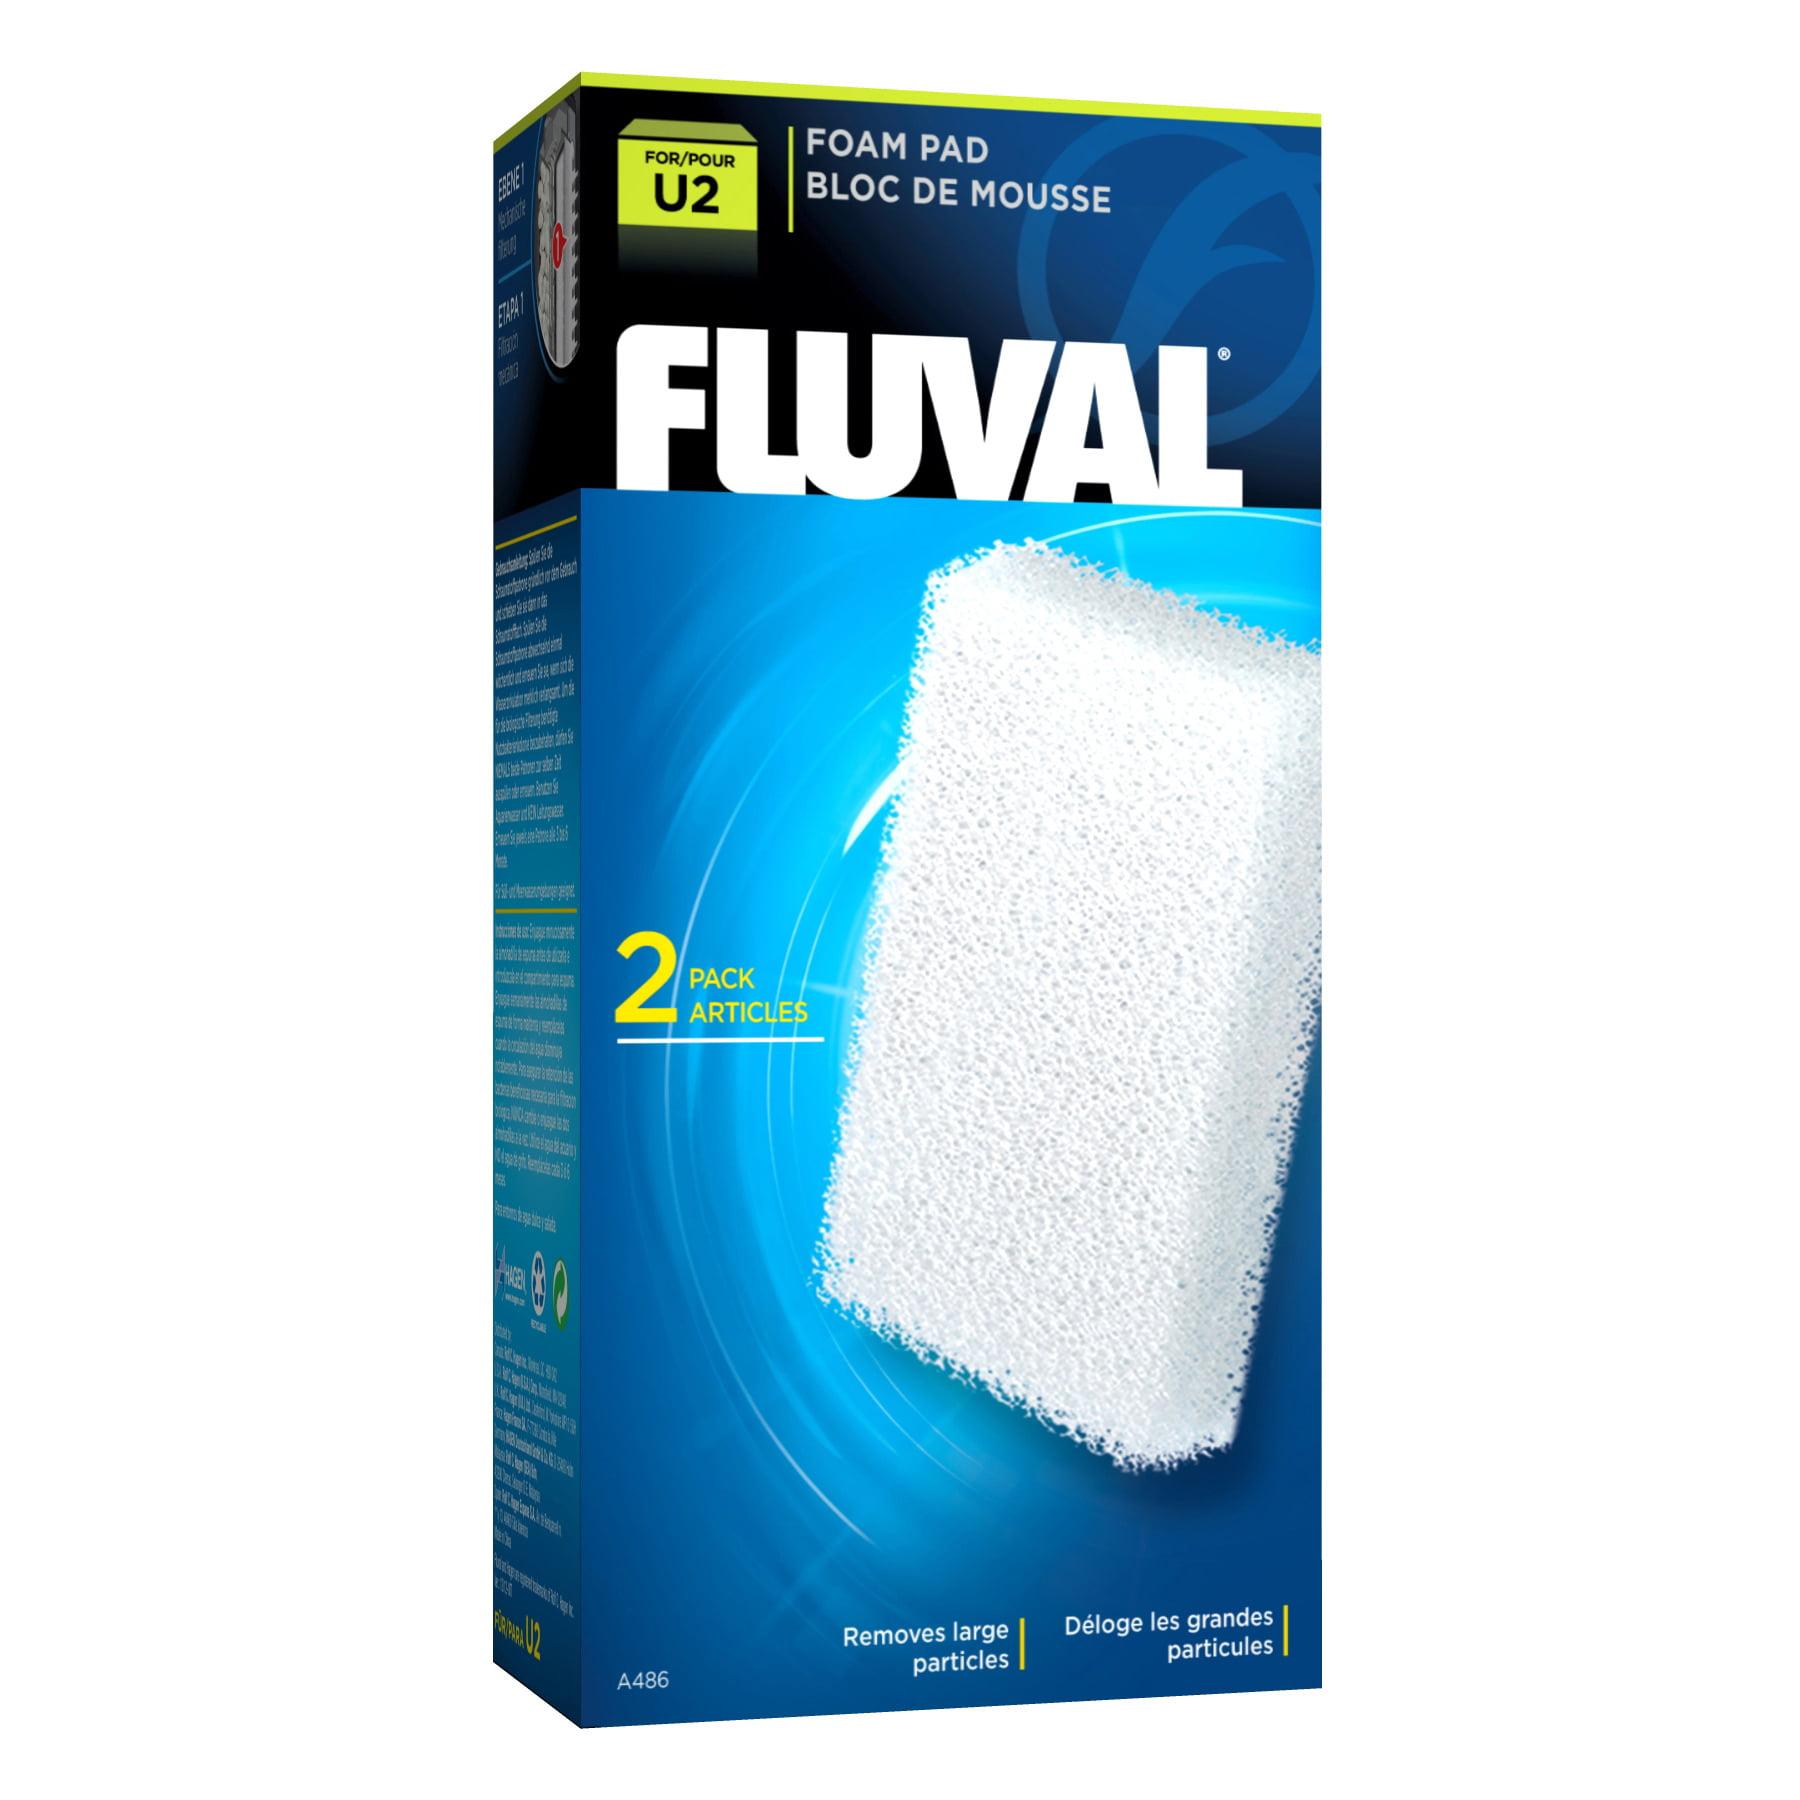 Fluval U2 Underwater Filter Foam Pad